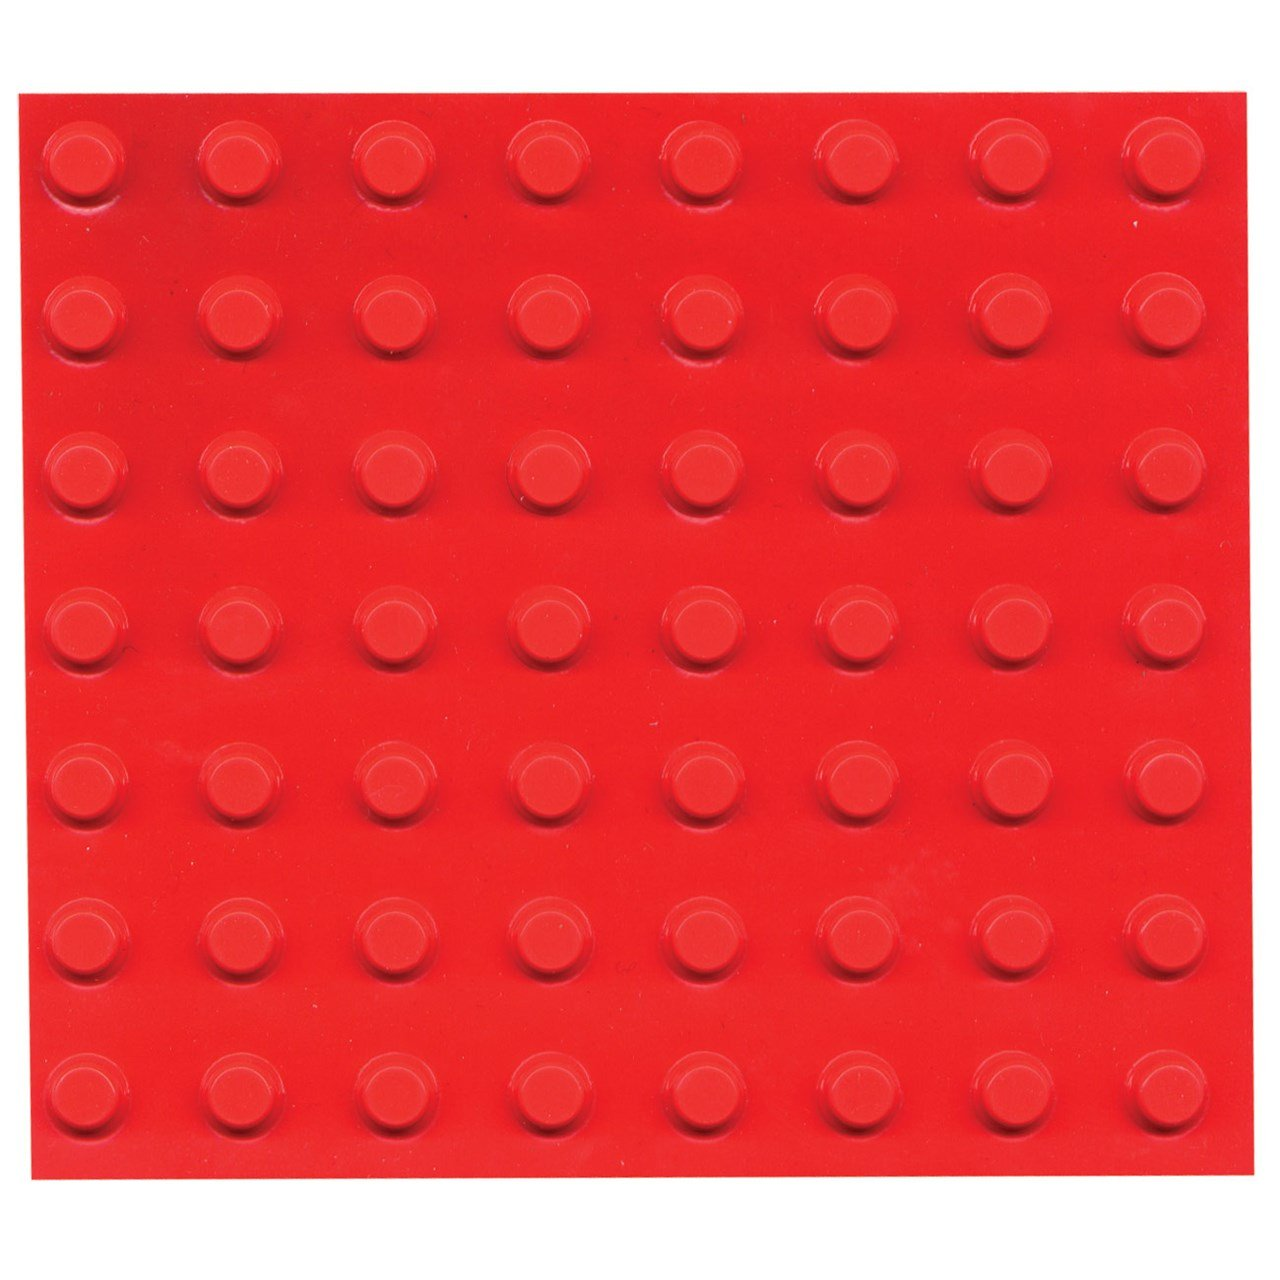 Bump Dots- Round-Flat Top-Fluor Orange-Small-56pk MaxiAids